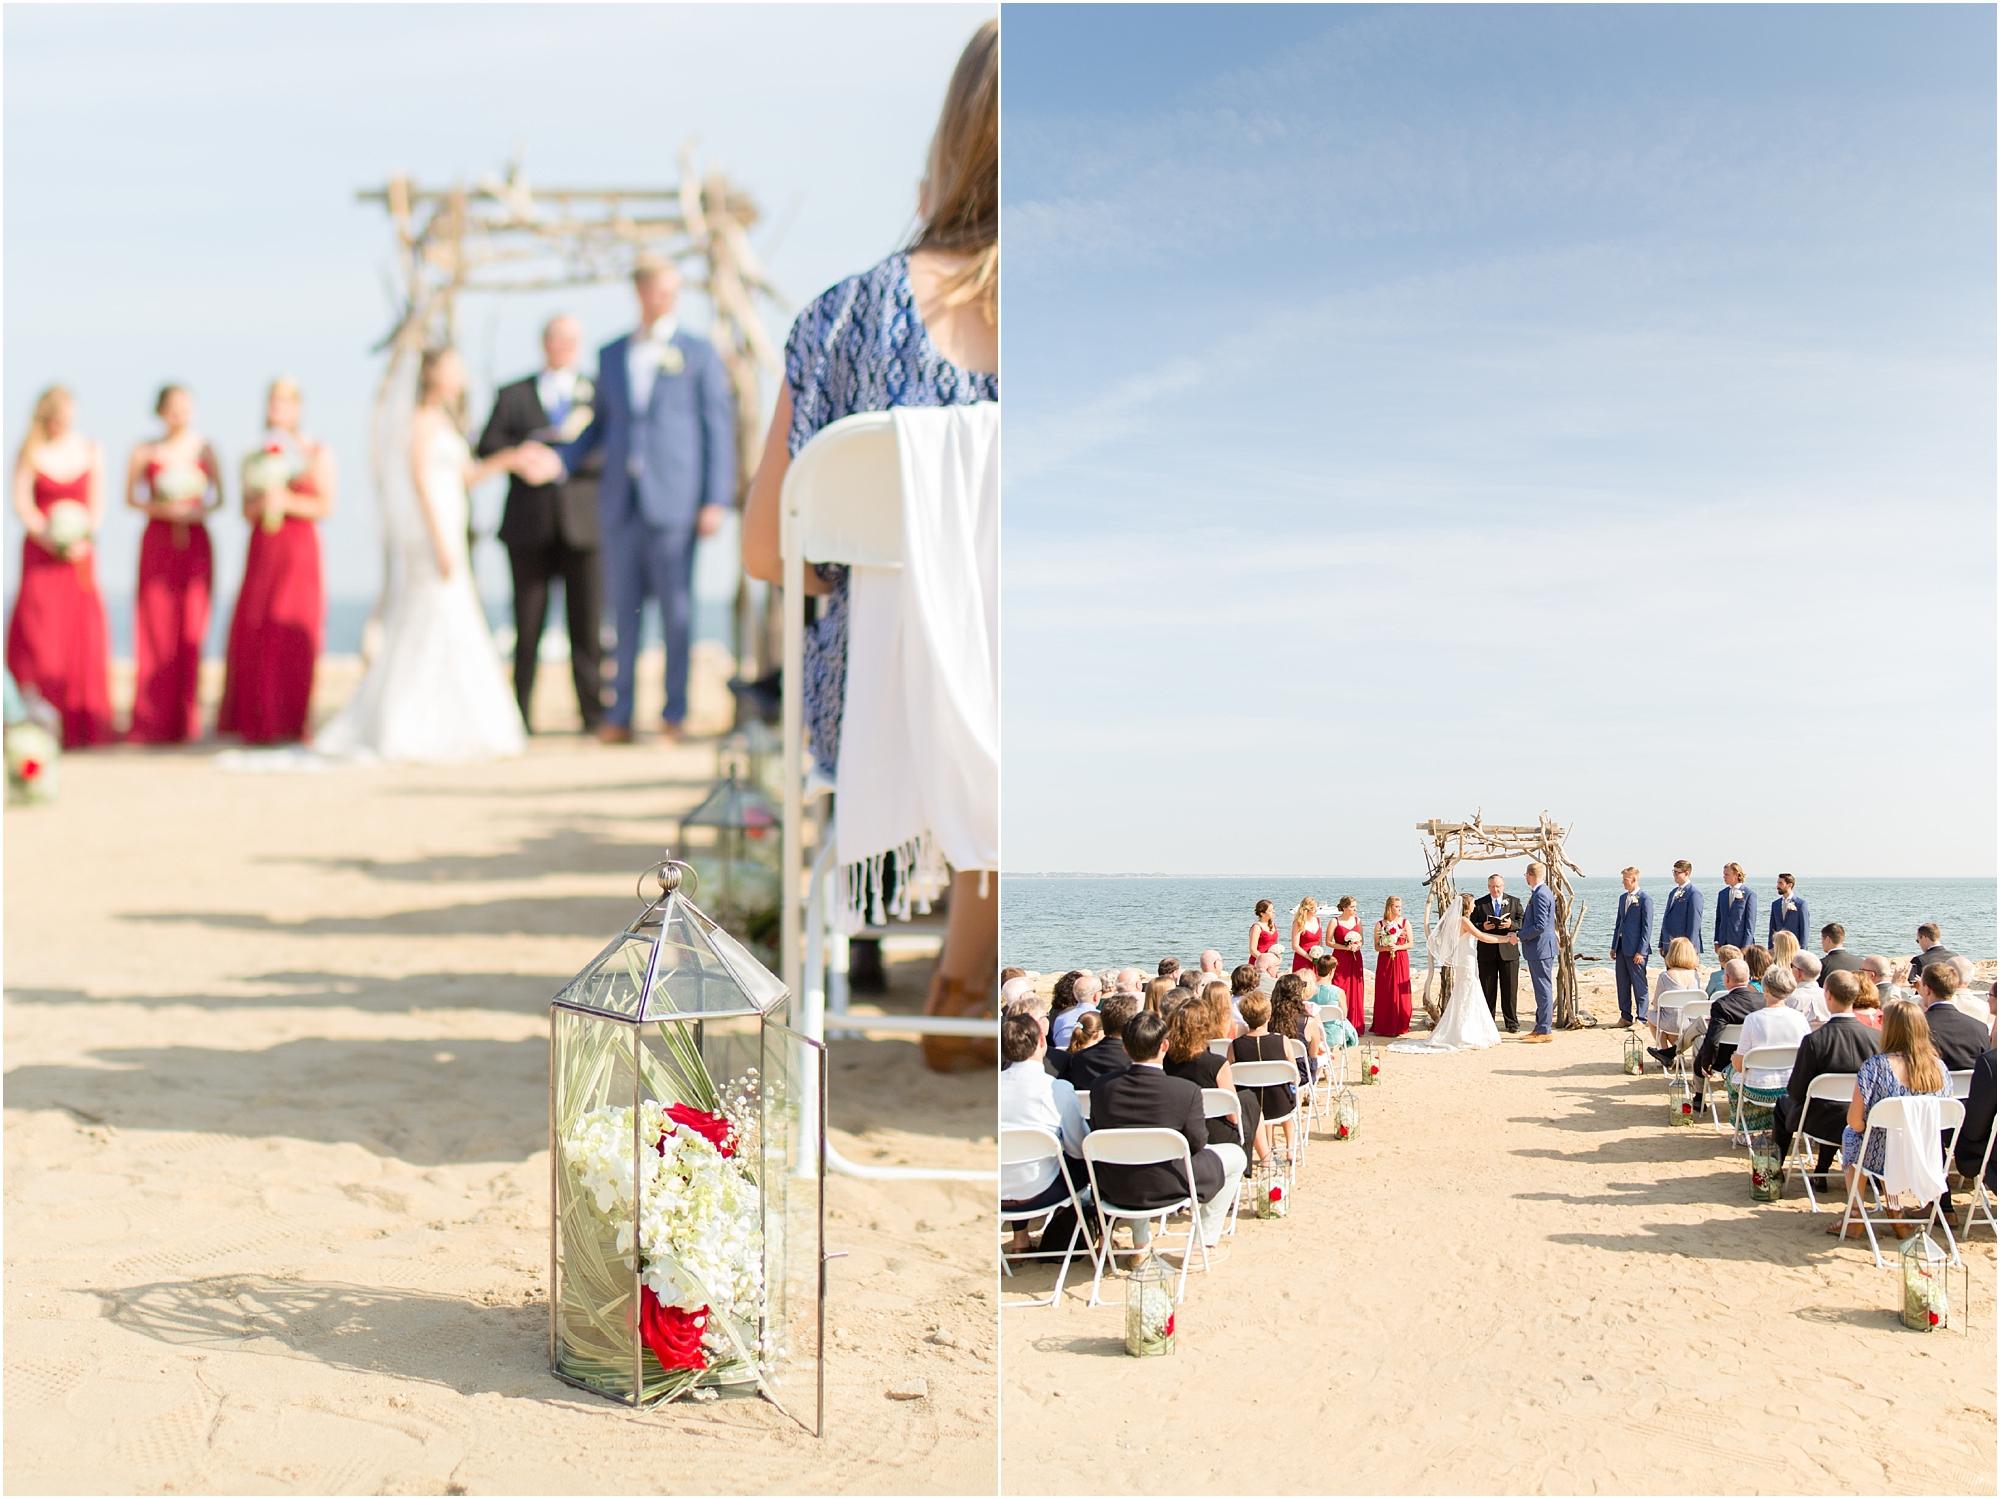 Goodman 5-Ceremony-666_anna grace photography wellfleet cape cod massachusetts destination wedding photographer Chequessett Yacht and Country Club wedding photo.jpg